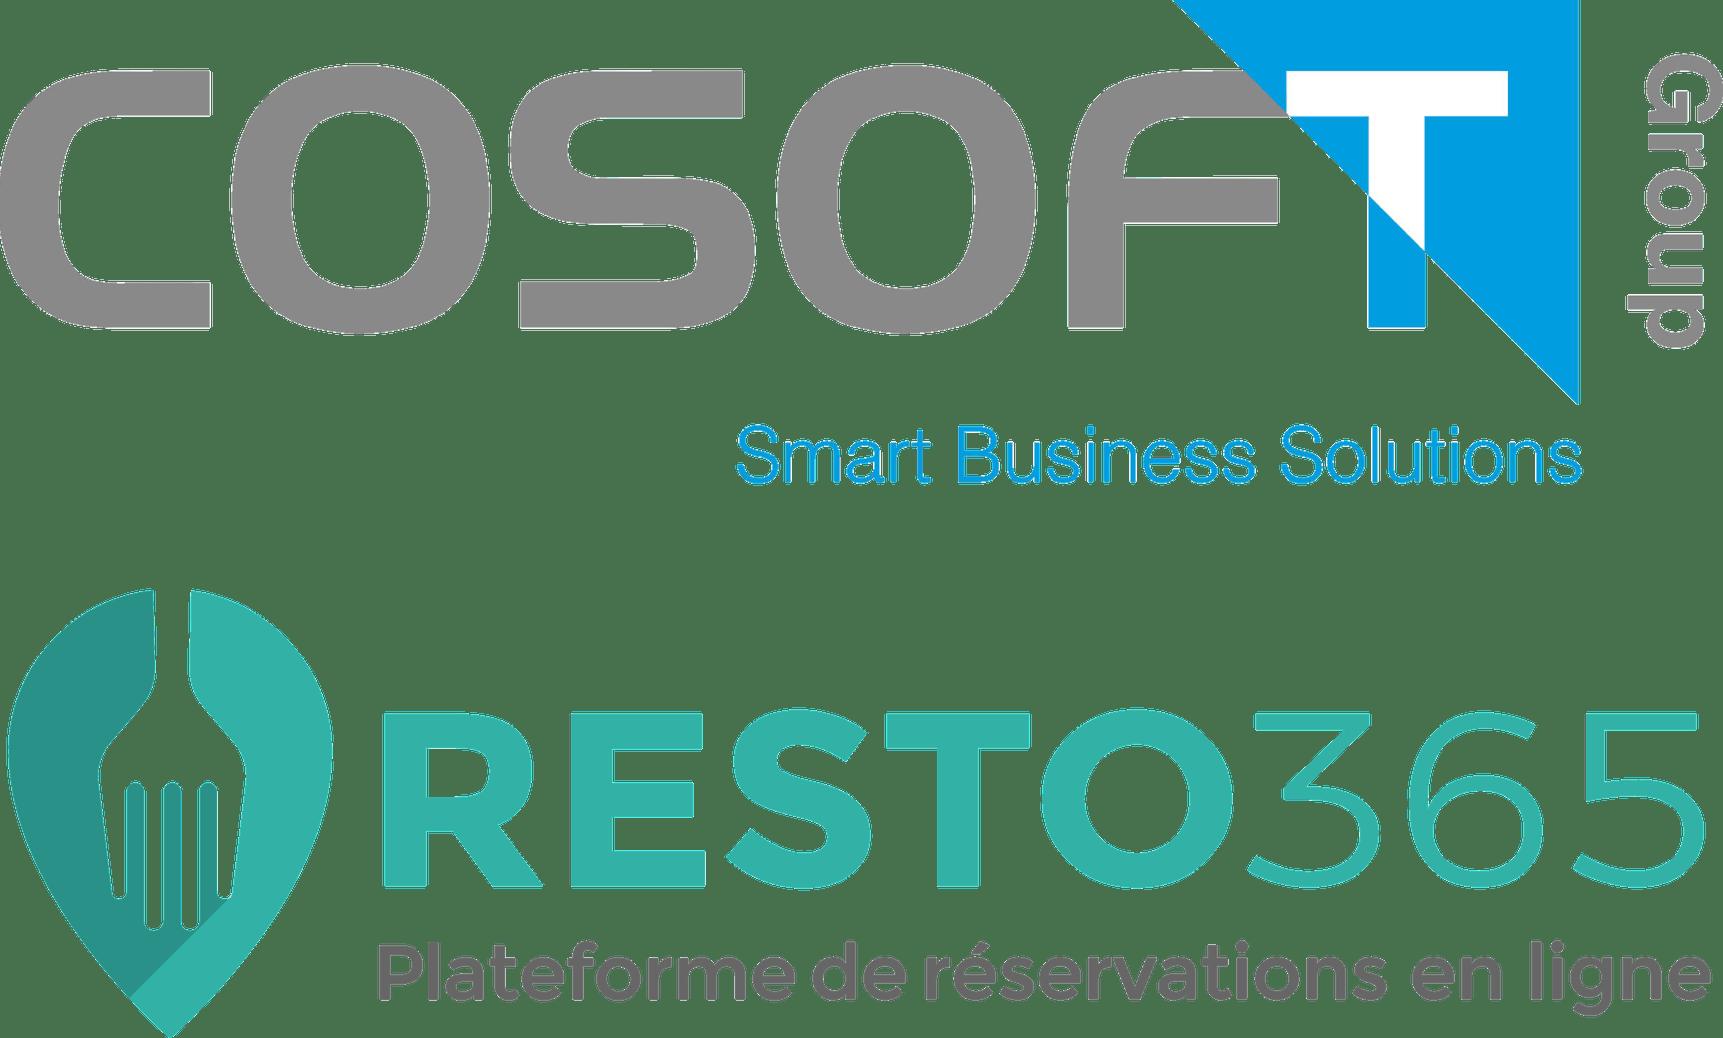 COSOFT Group/RESTO365